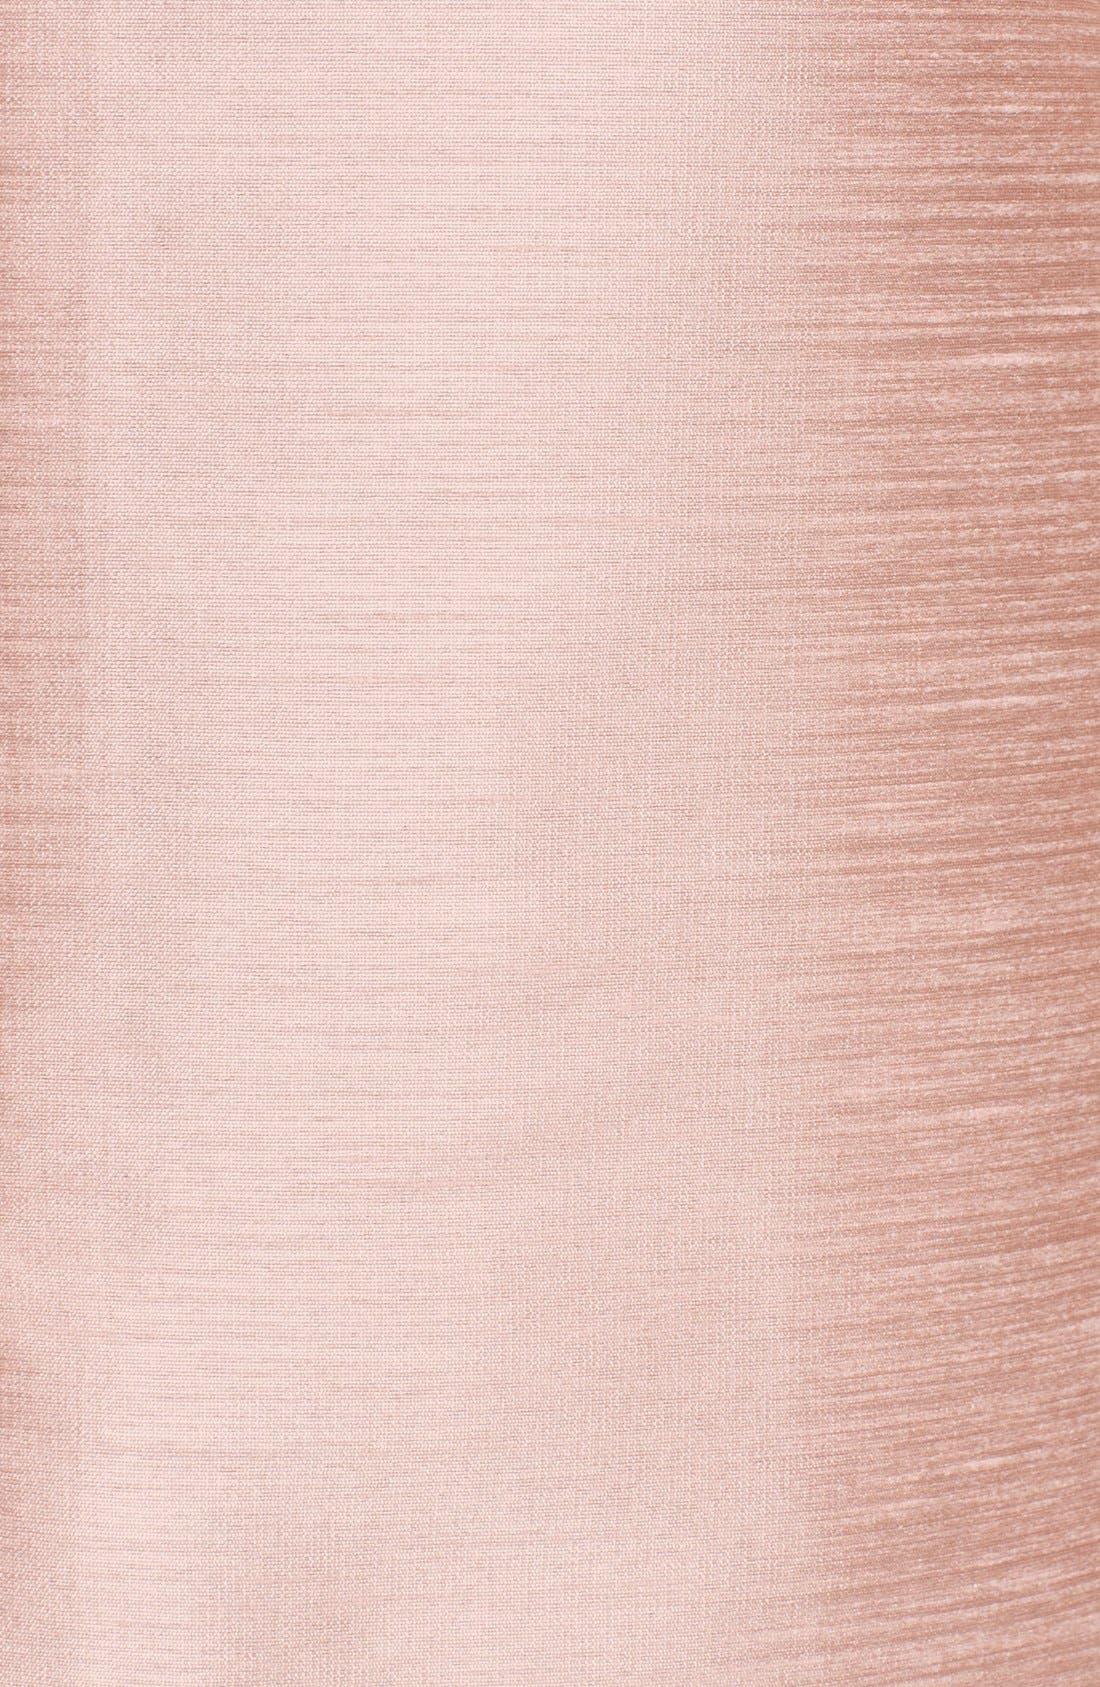 Boatneck Sheath Dress,                             Alternate thumbnail 10, color,                             PEARL PINK